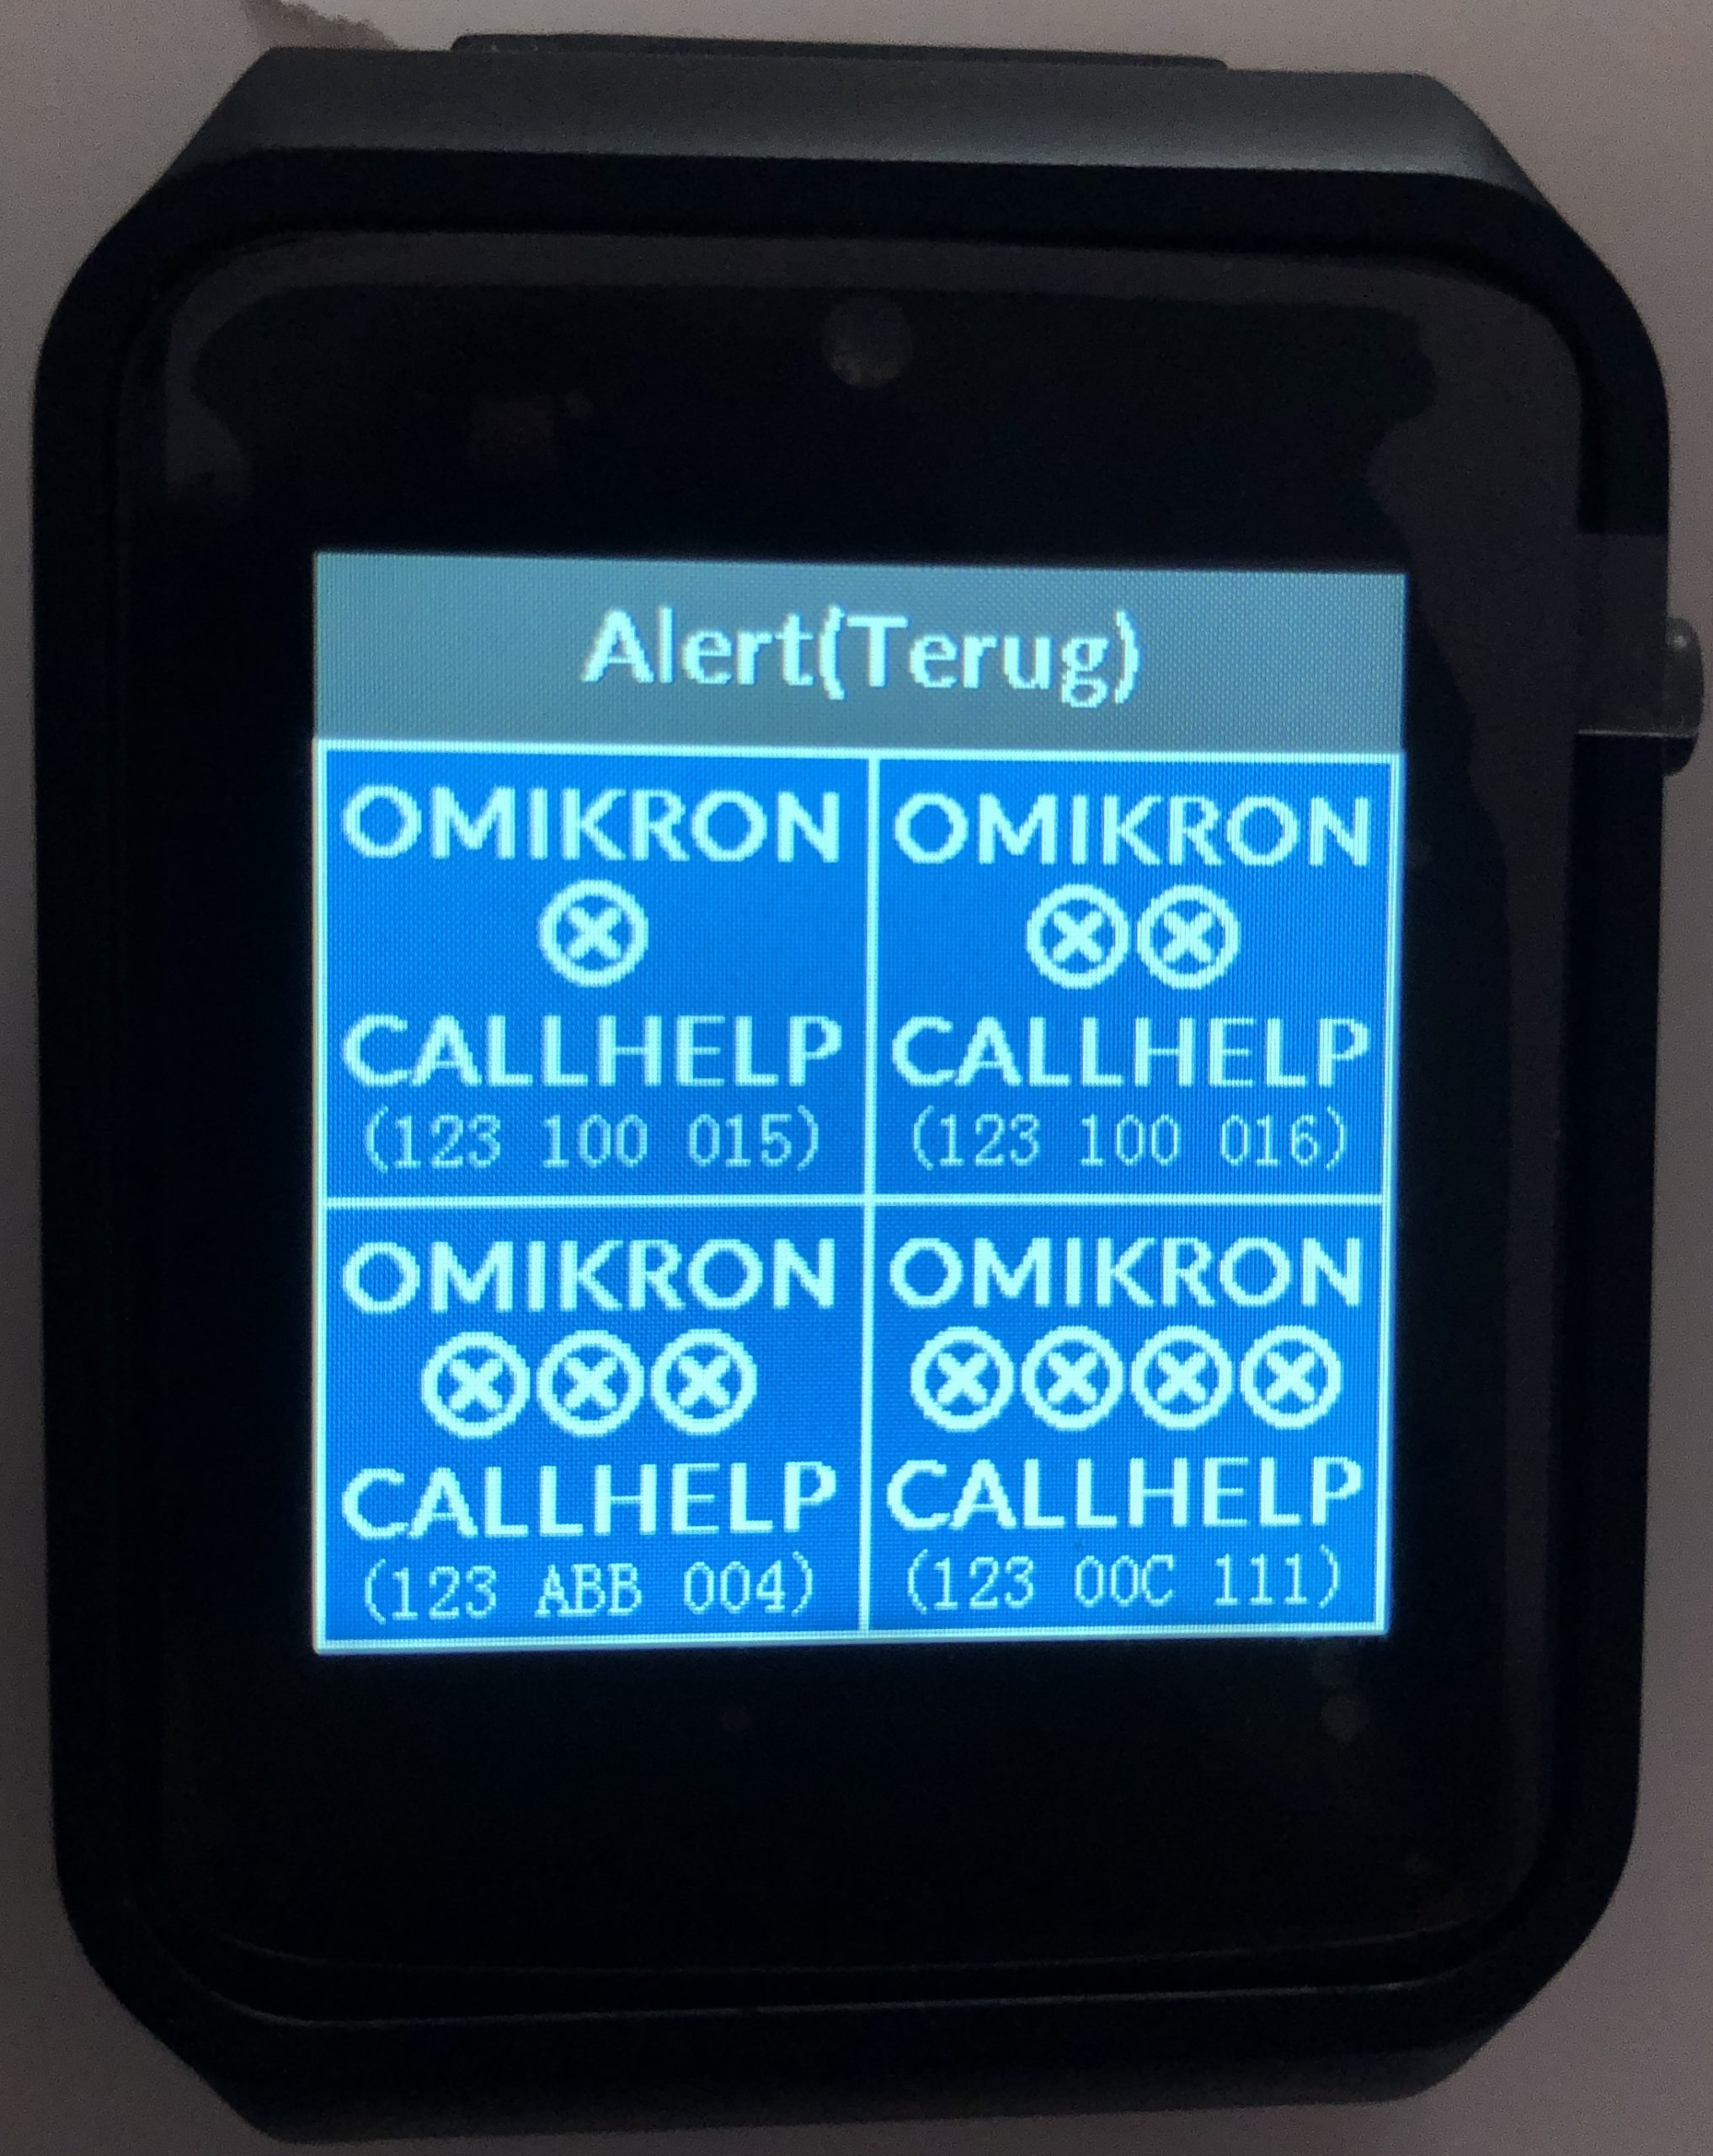 oproepontvanger alarmpager pager noodknop alarmontvanger